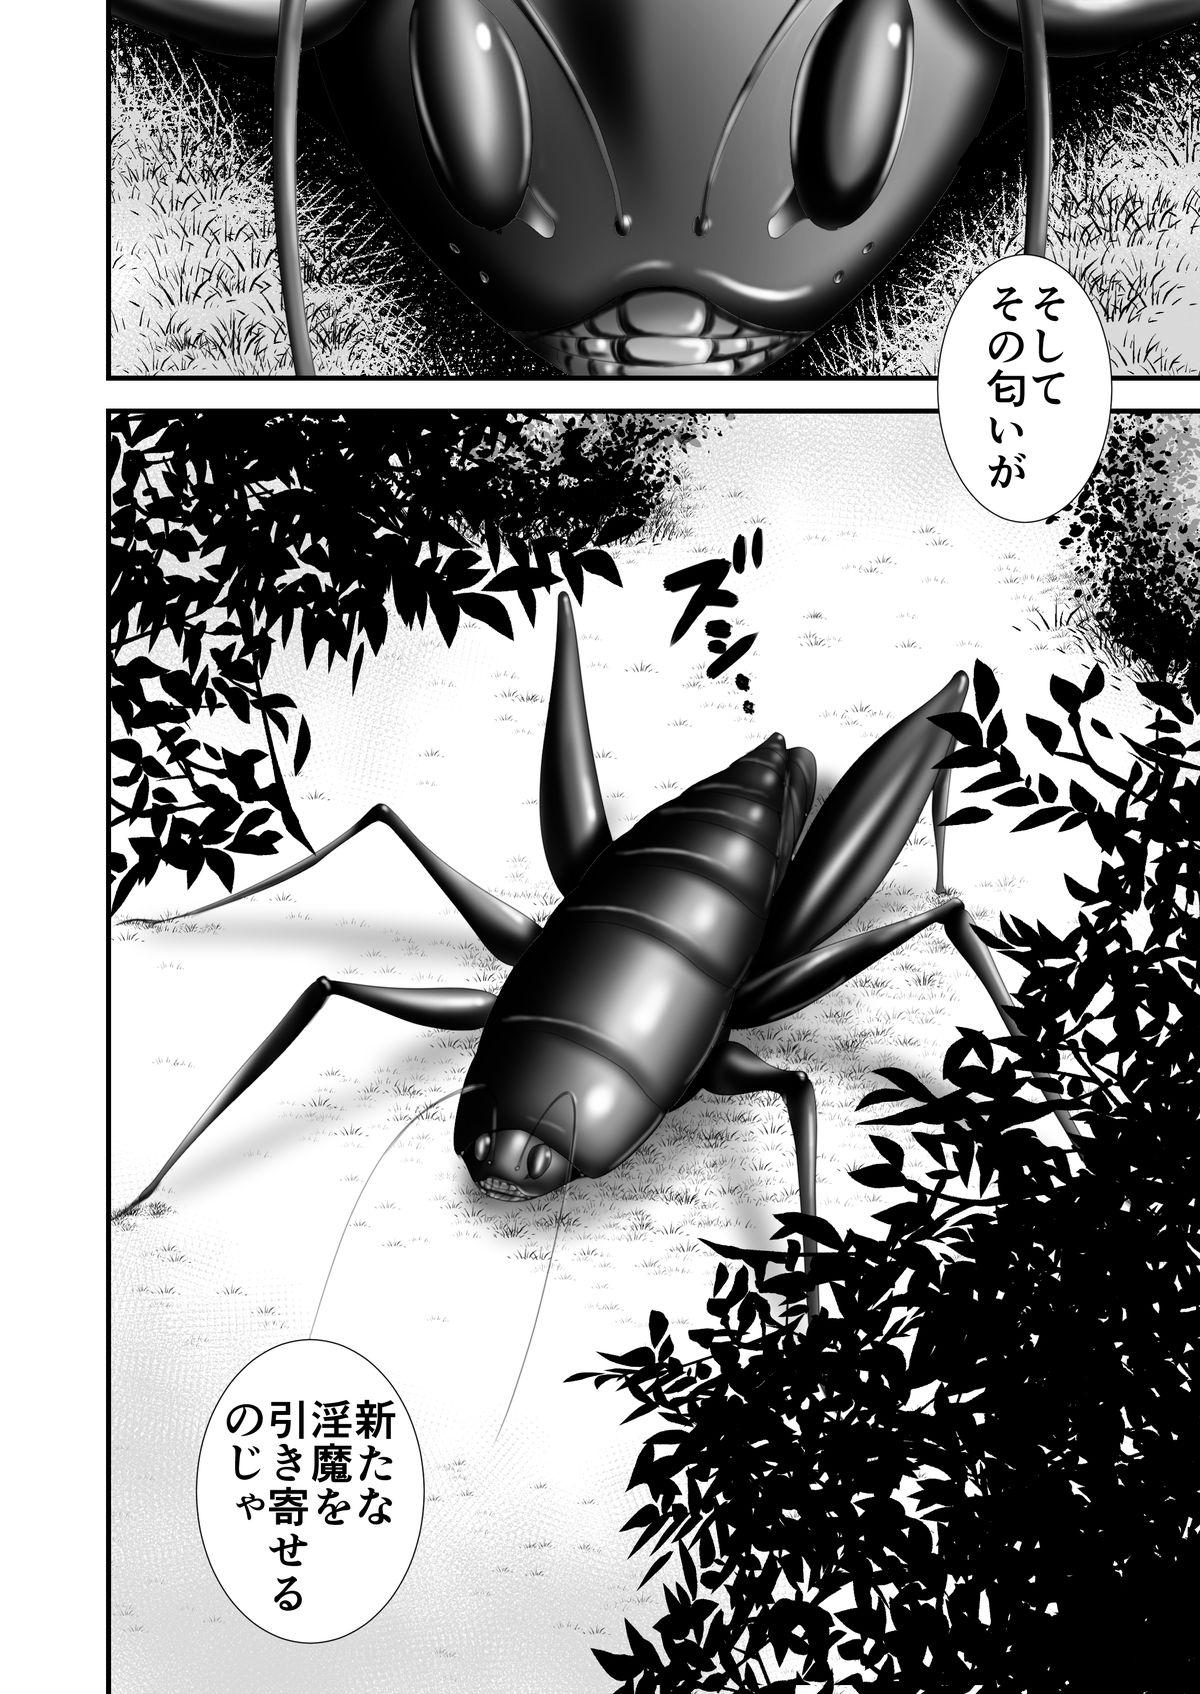 Inma Toubatsu Daisakusen Episode 3 19